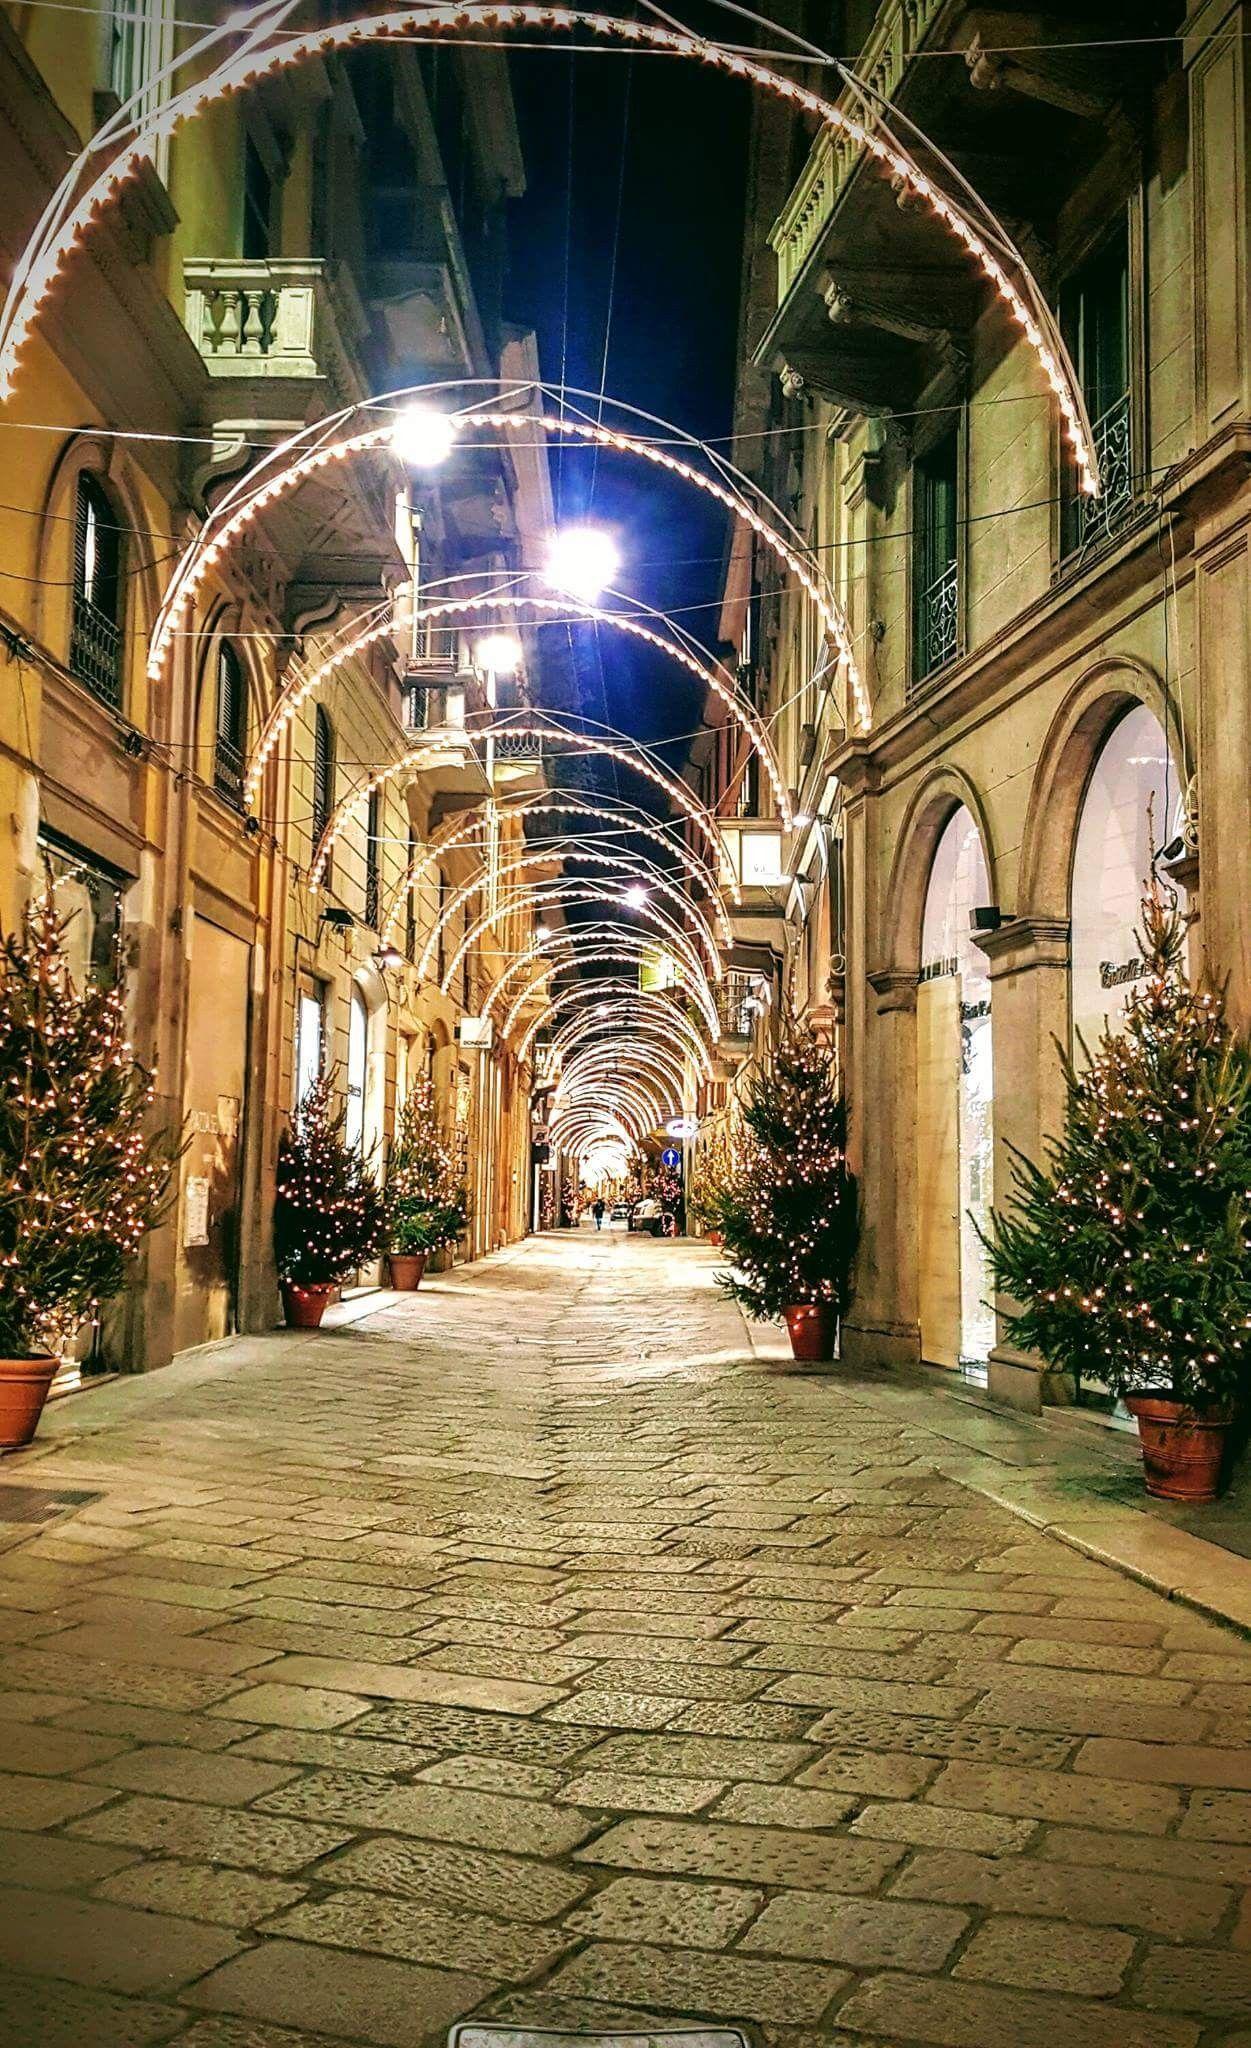 Via San Maurilio Milano via della spiga, milano | paesaggi, milano, italia